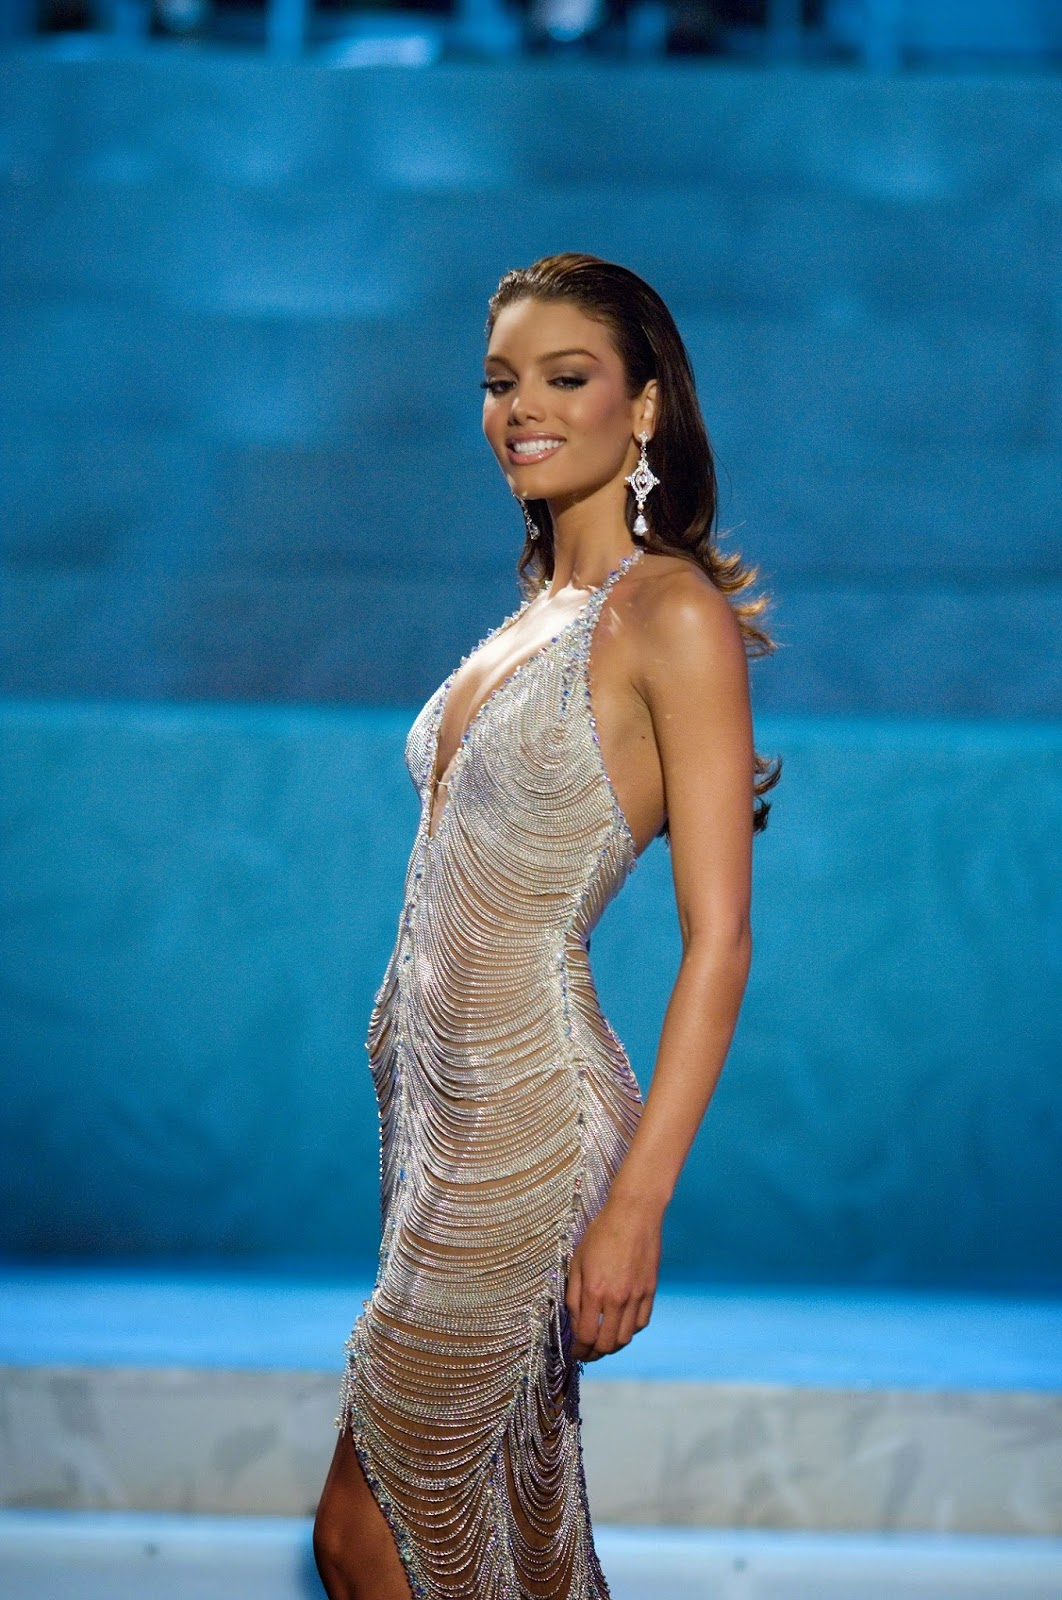 Miss bikini of the universe 2006 winner